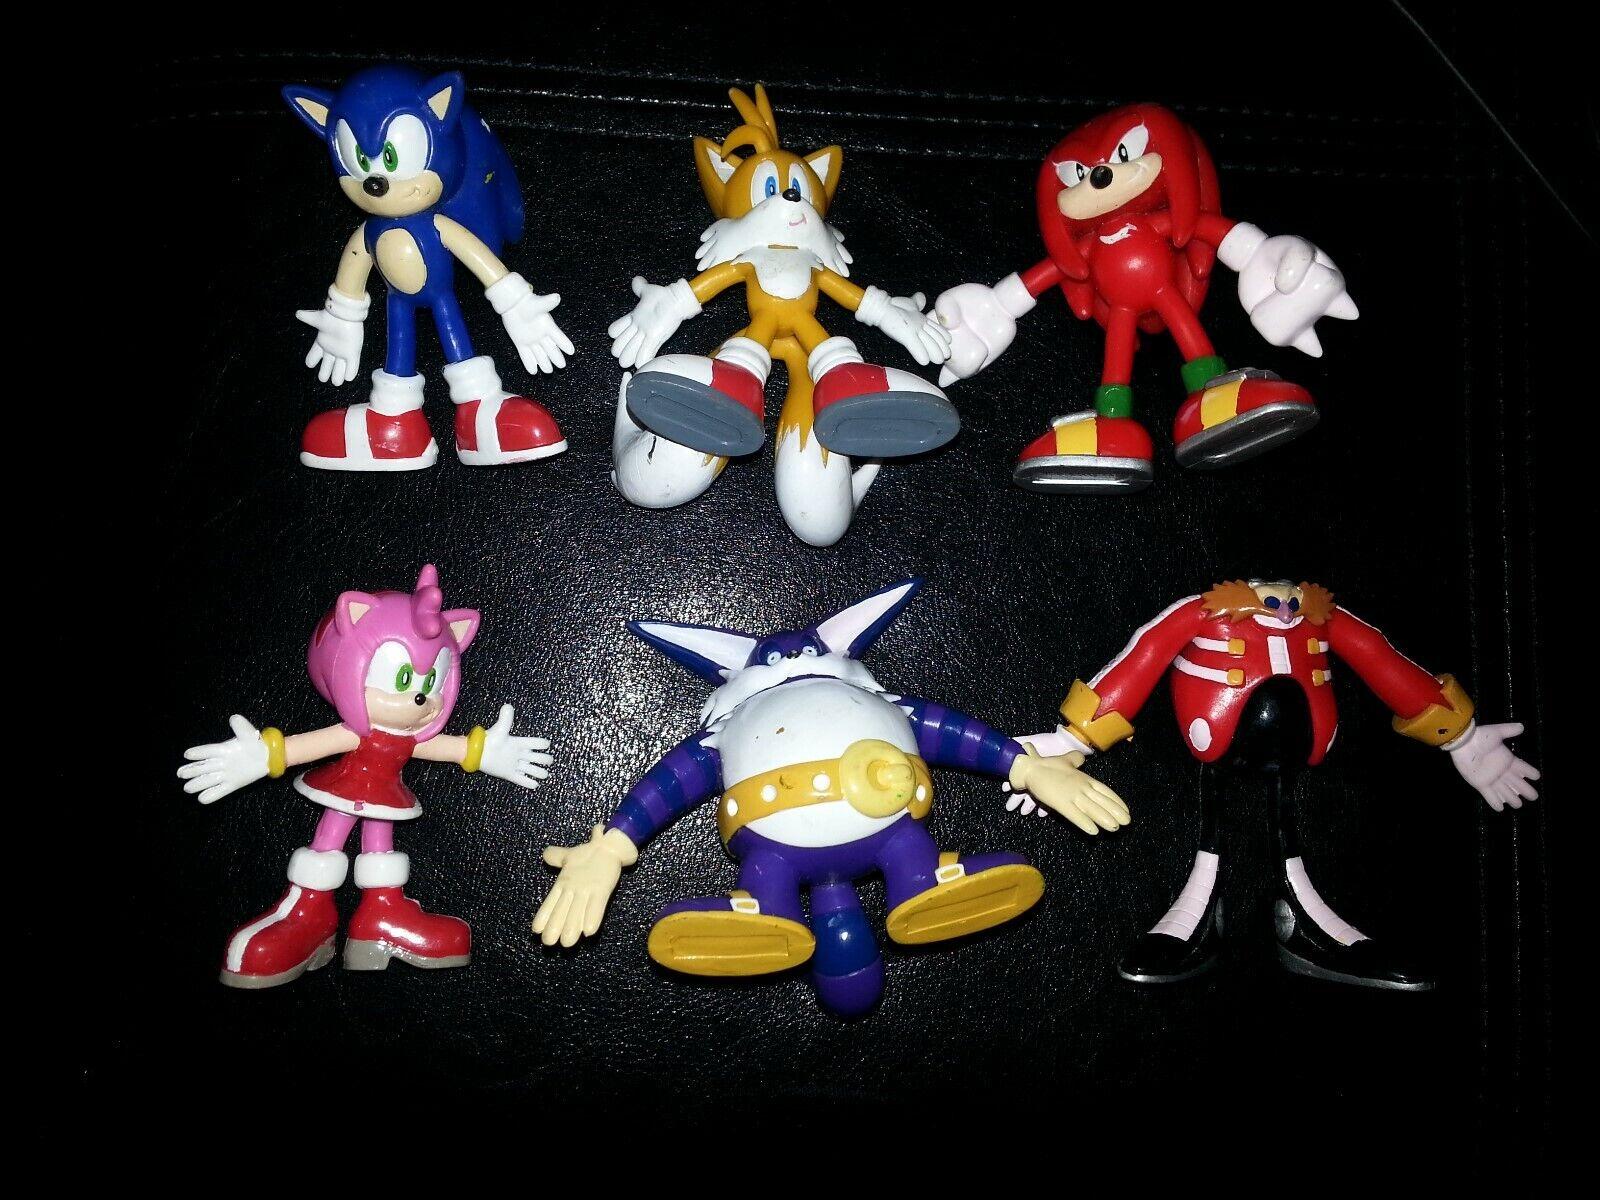 SEGA 2000 Sonic Adventures Sonic the Hedgehog Complete Set of 6 Bendable Figures